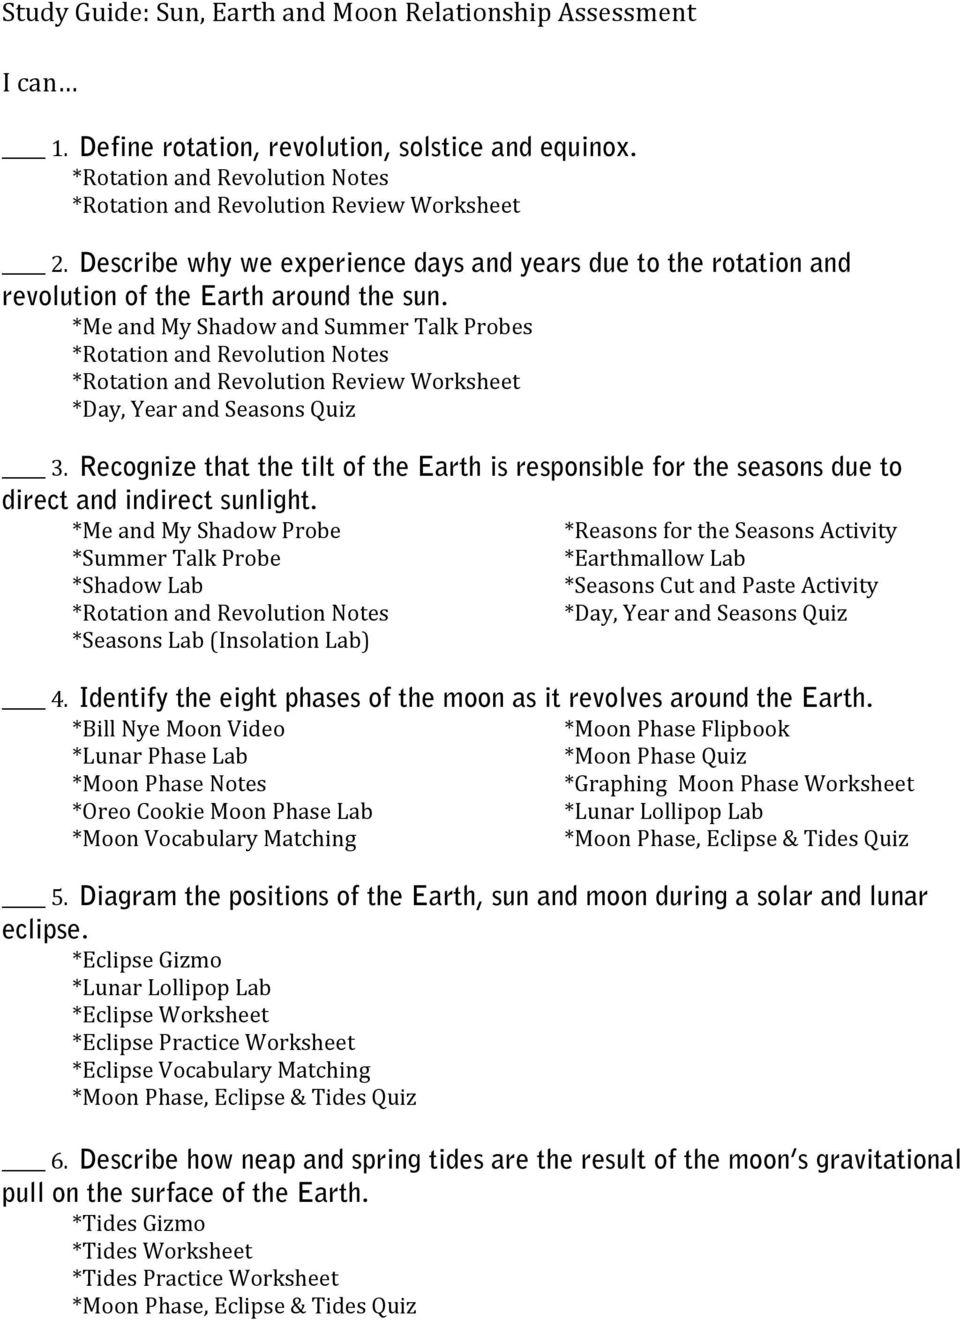 hight resolution of Study Guide: Sun